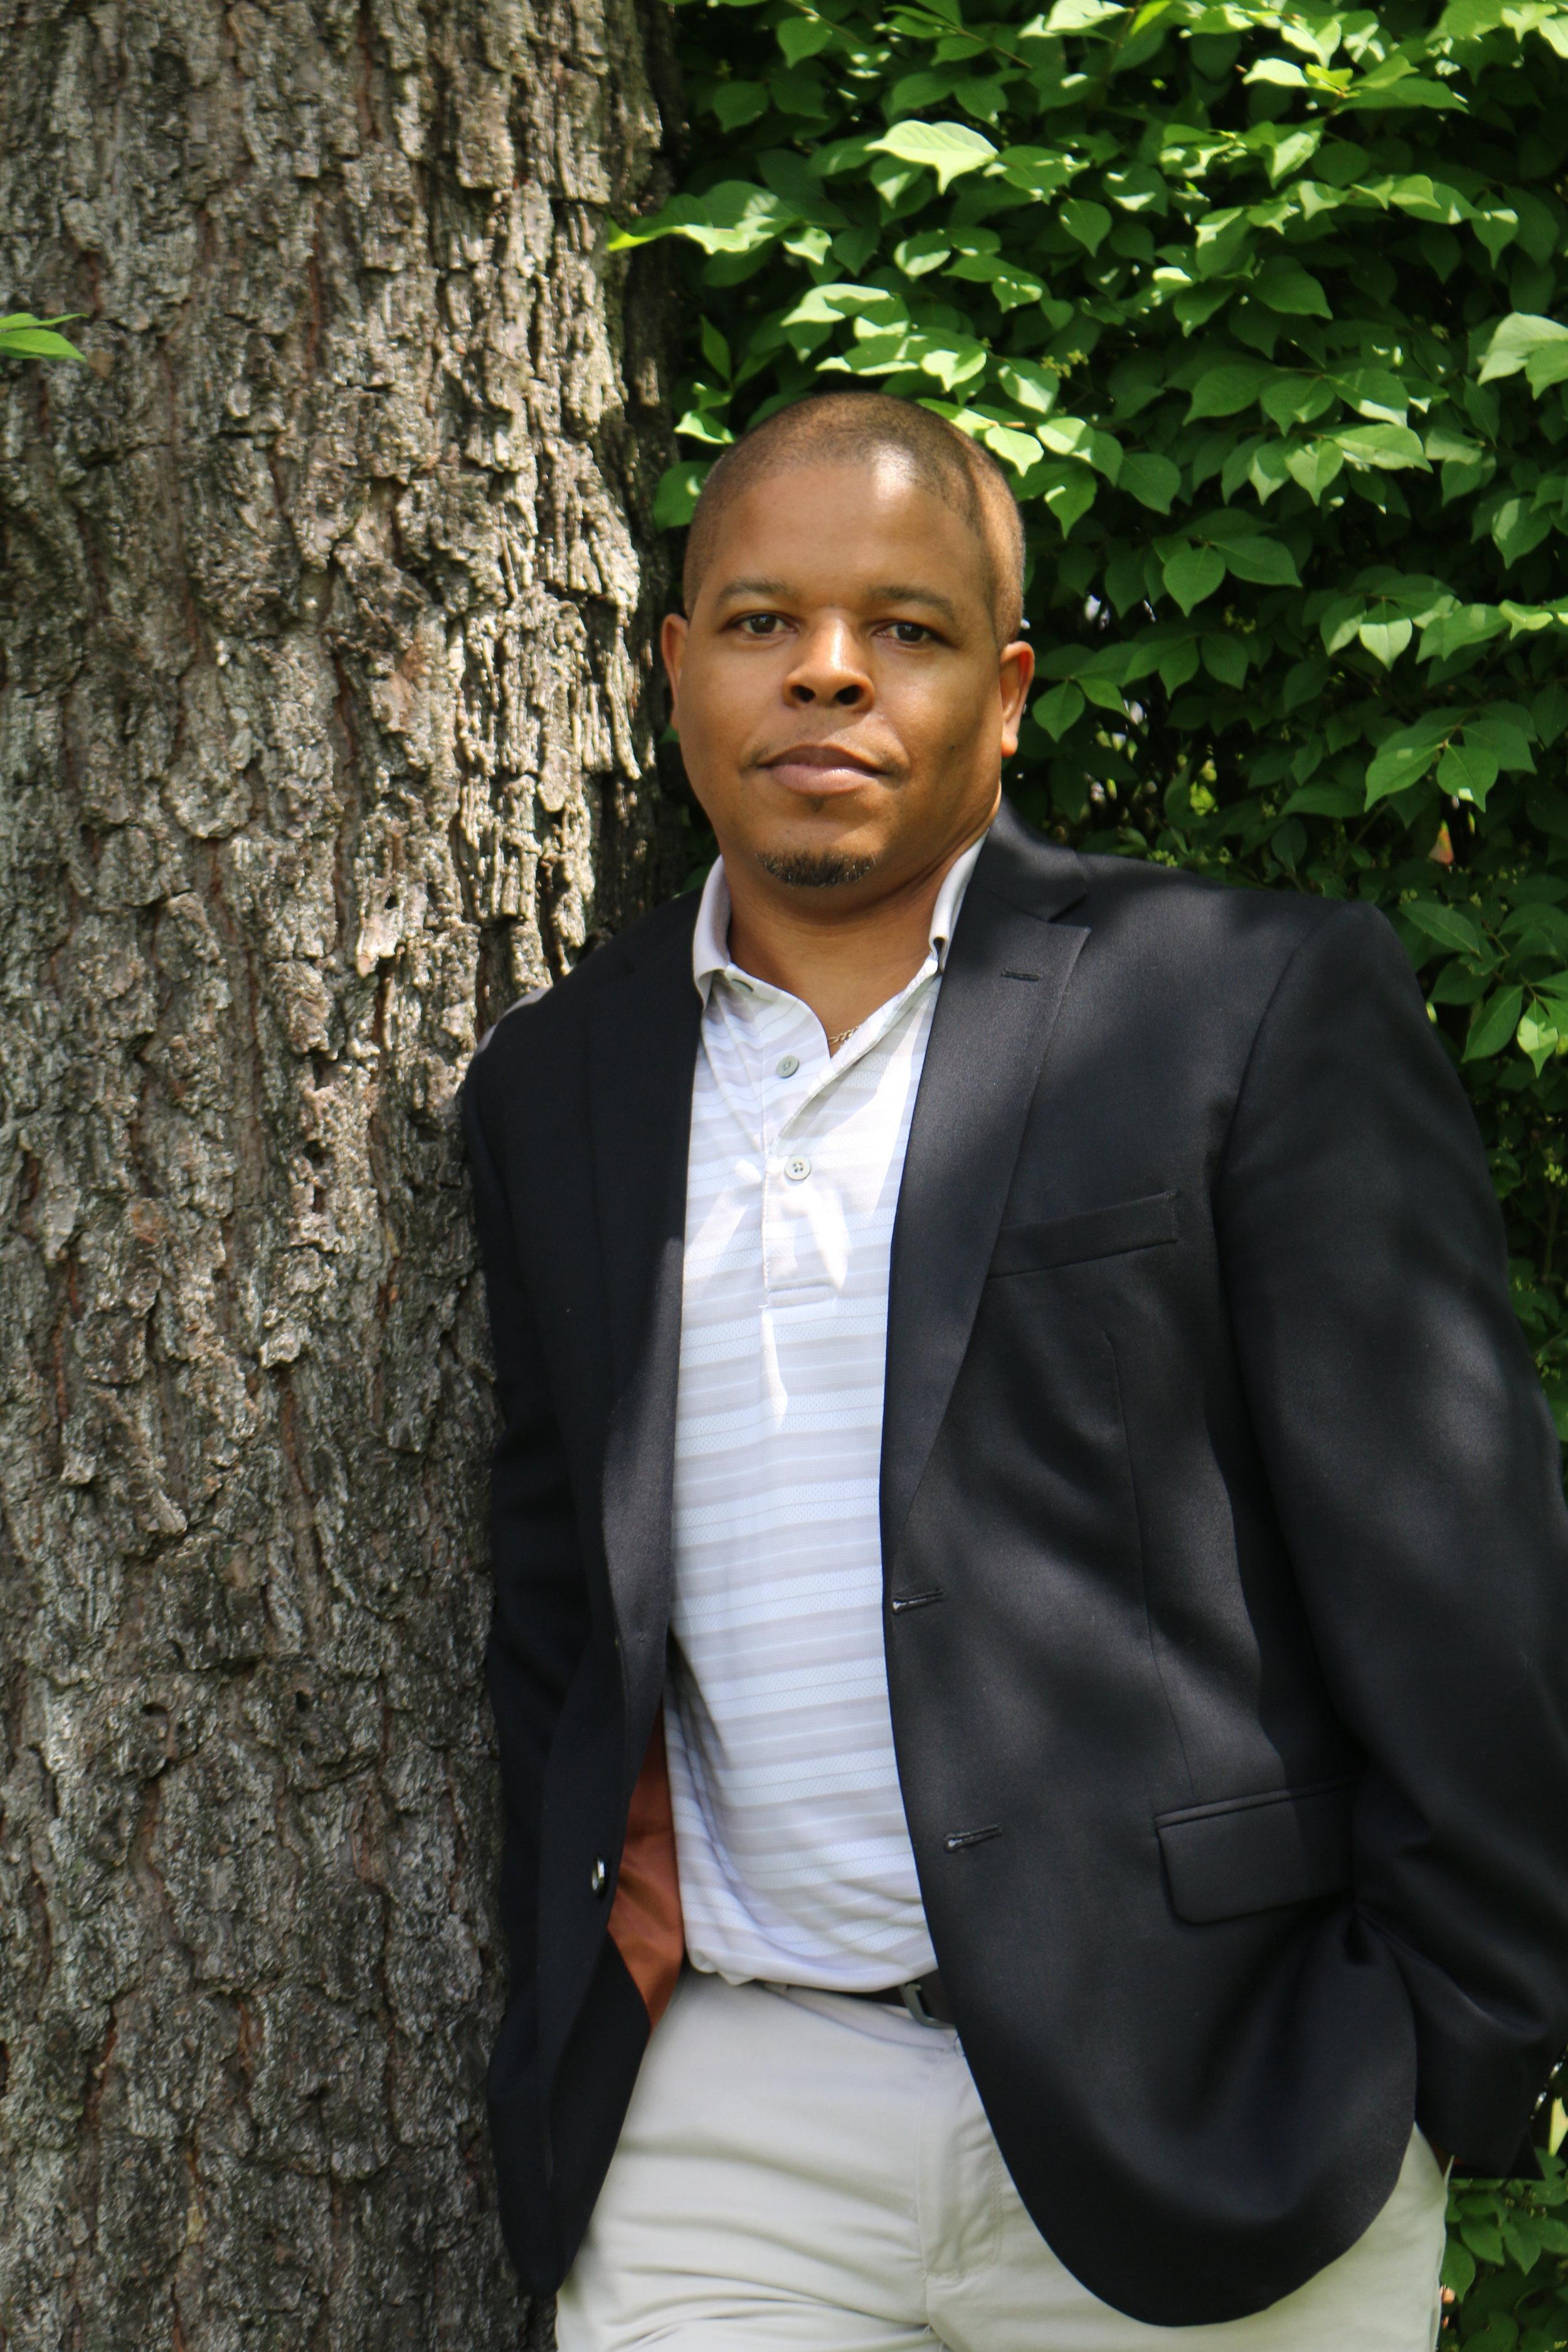 Pastor Patrick L. Russell, Lead Pastor Ridgley Ministries